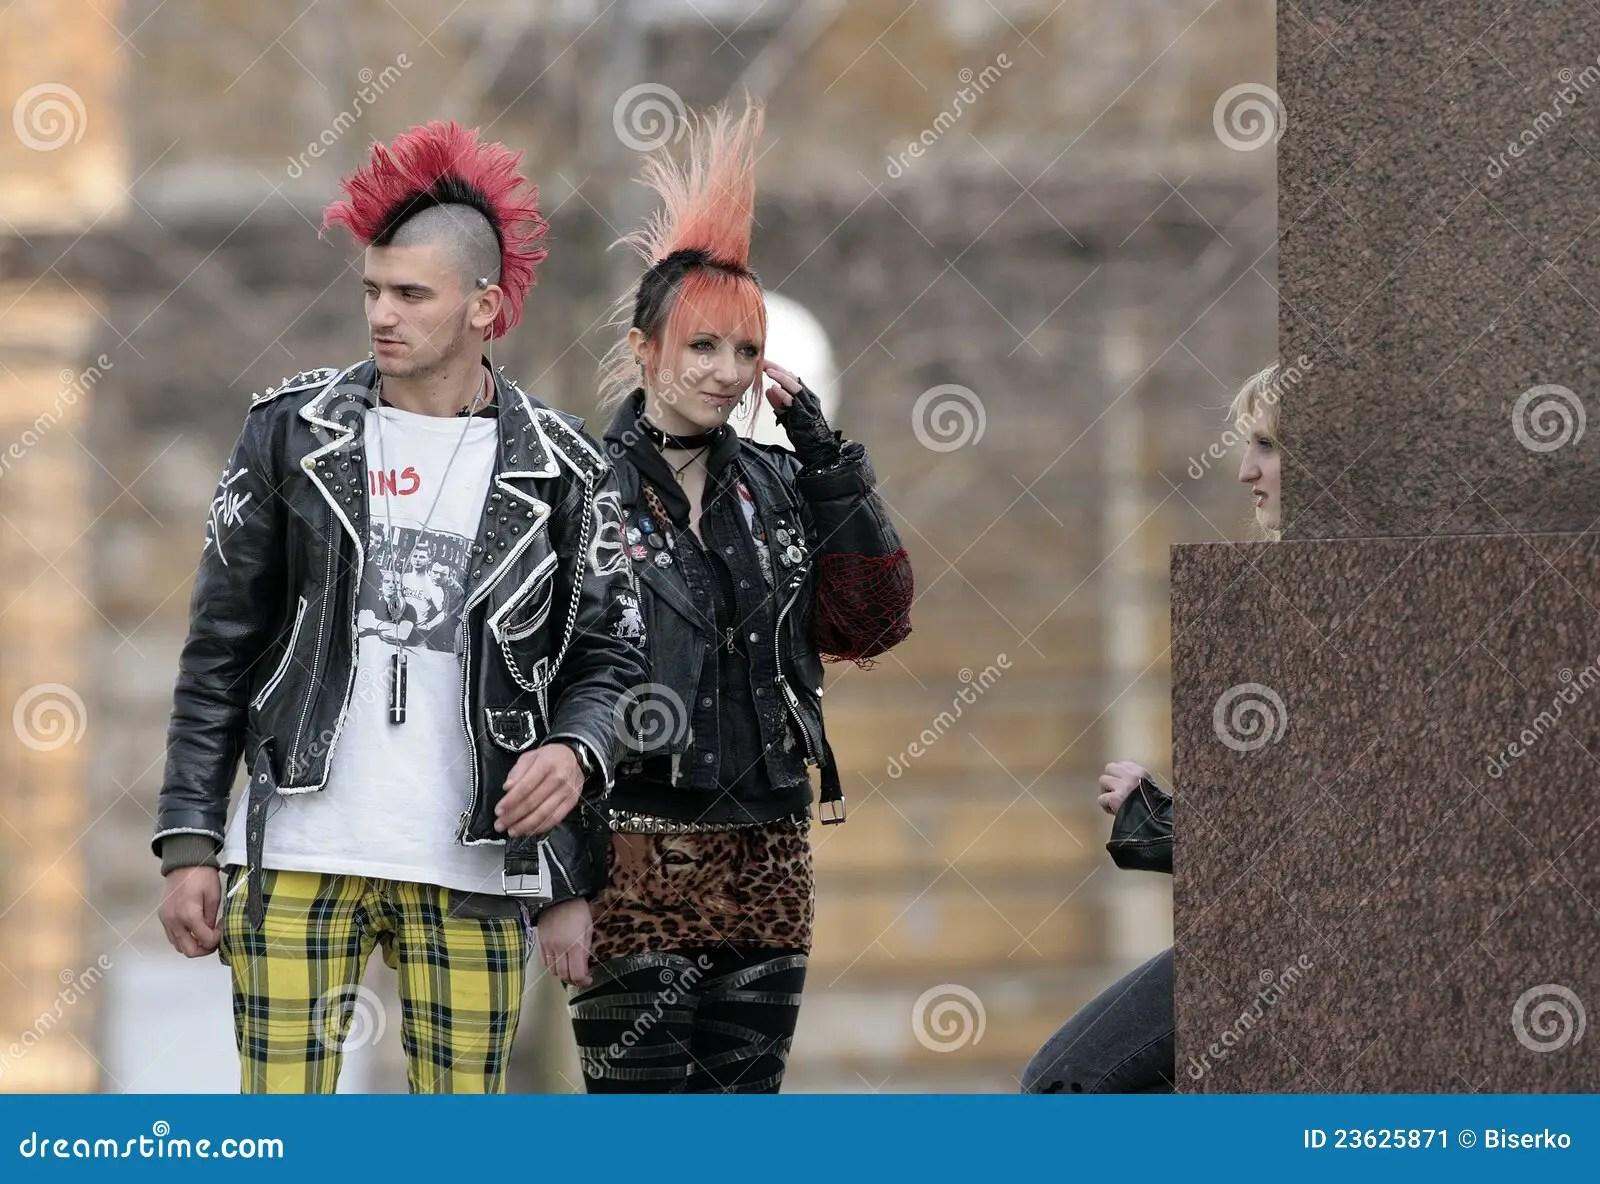 Punk fashion editorial photo Image of metal irokese